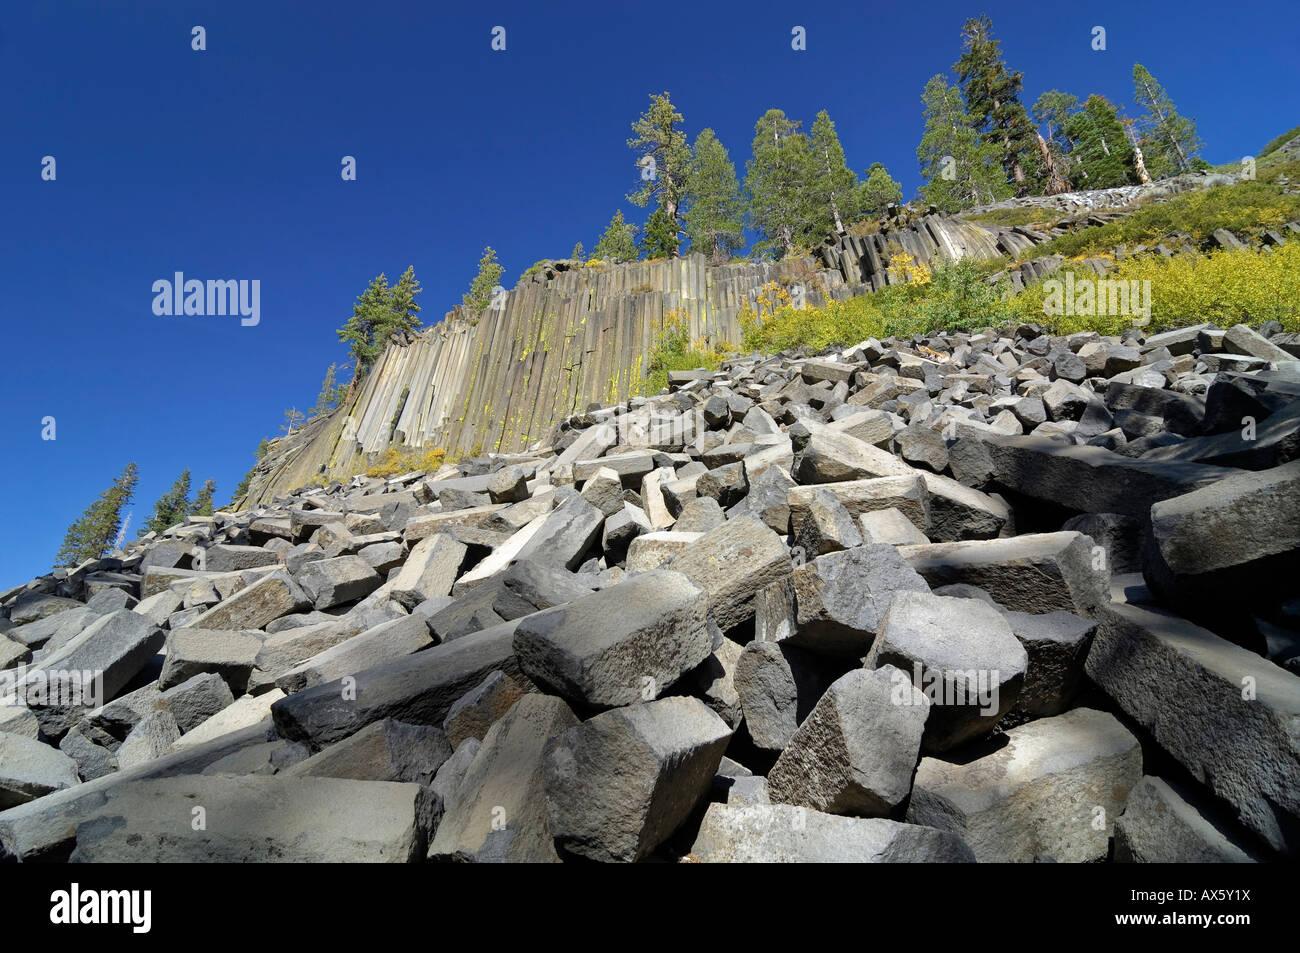 Broken-off pieces of basalt columns at Mammoth Lake, Devil's Postpile National Monument, California, USA - Stock Image